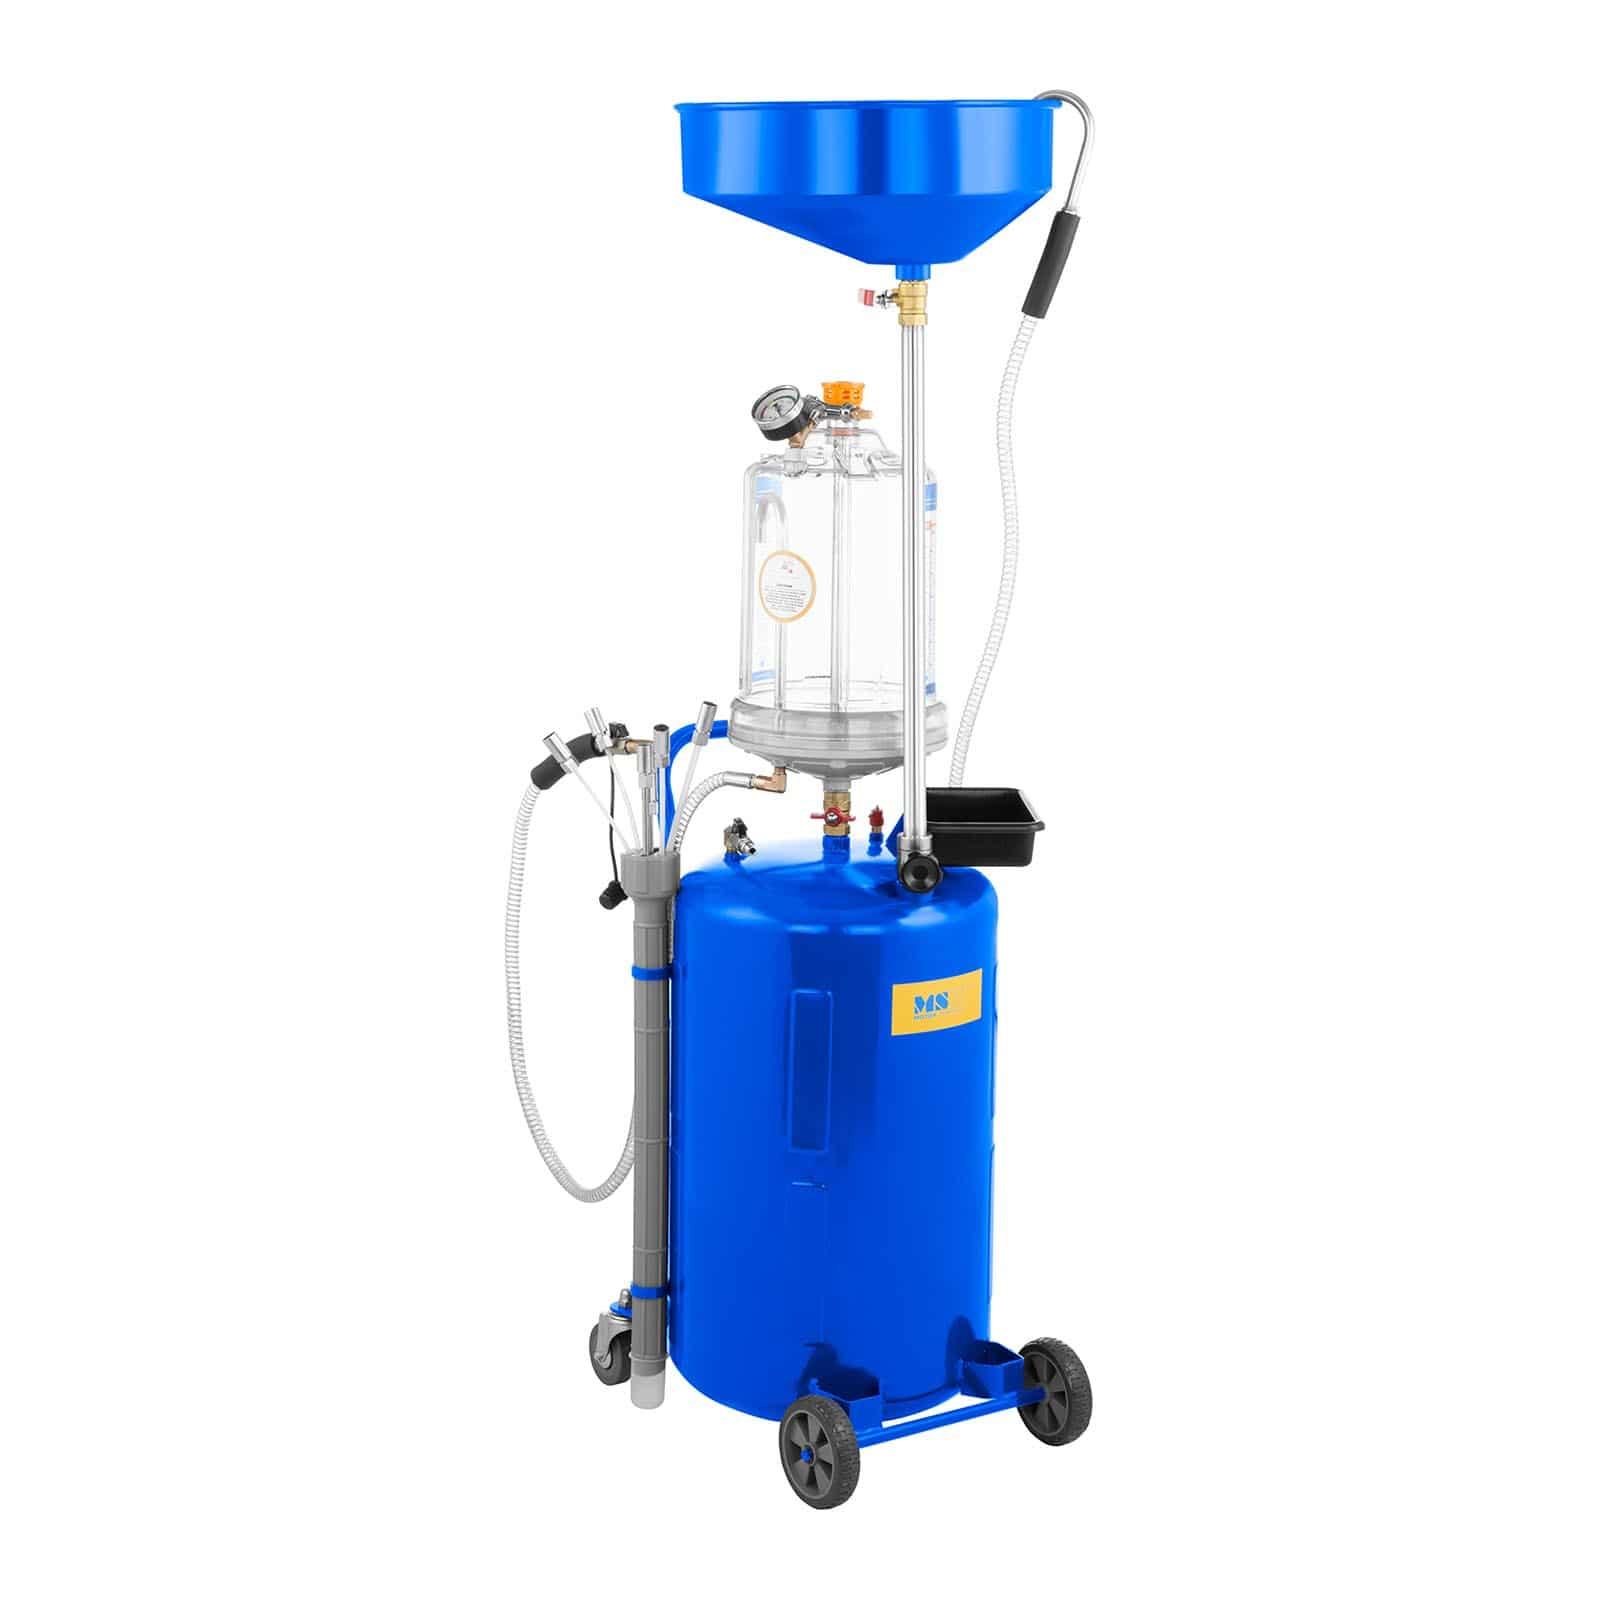 Olieverversing apparatuur